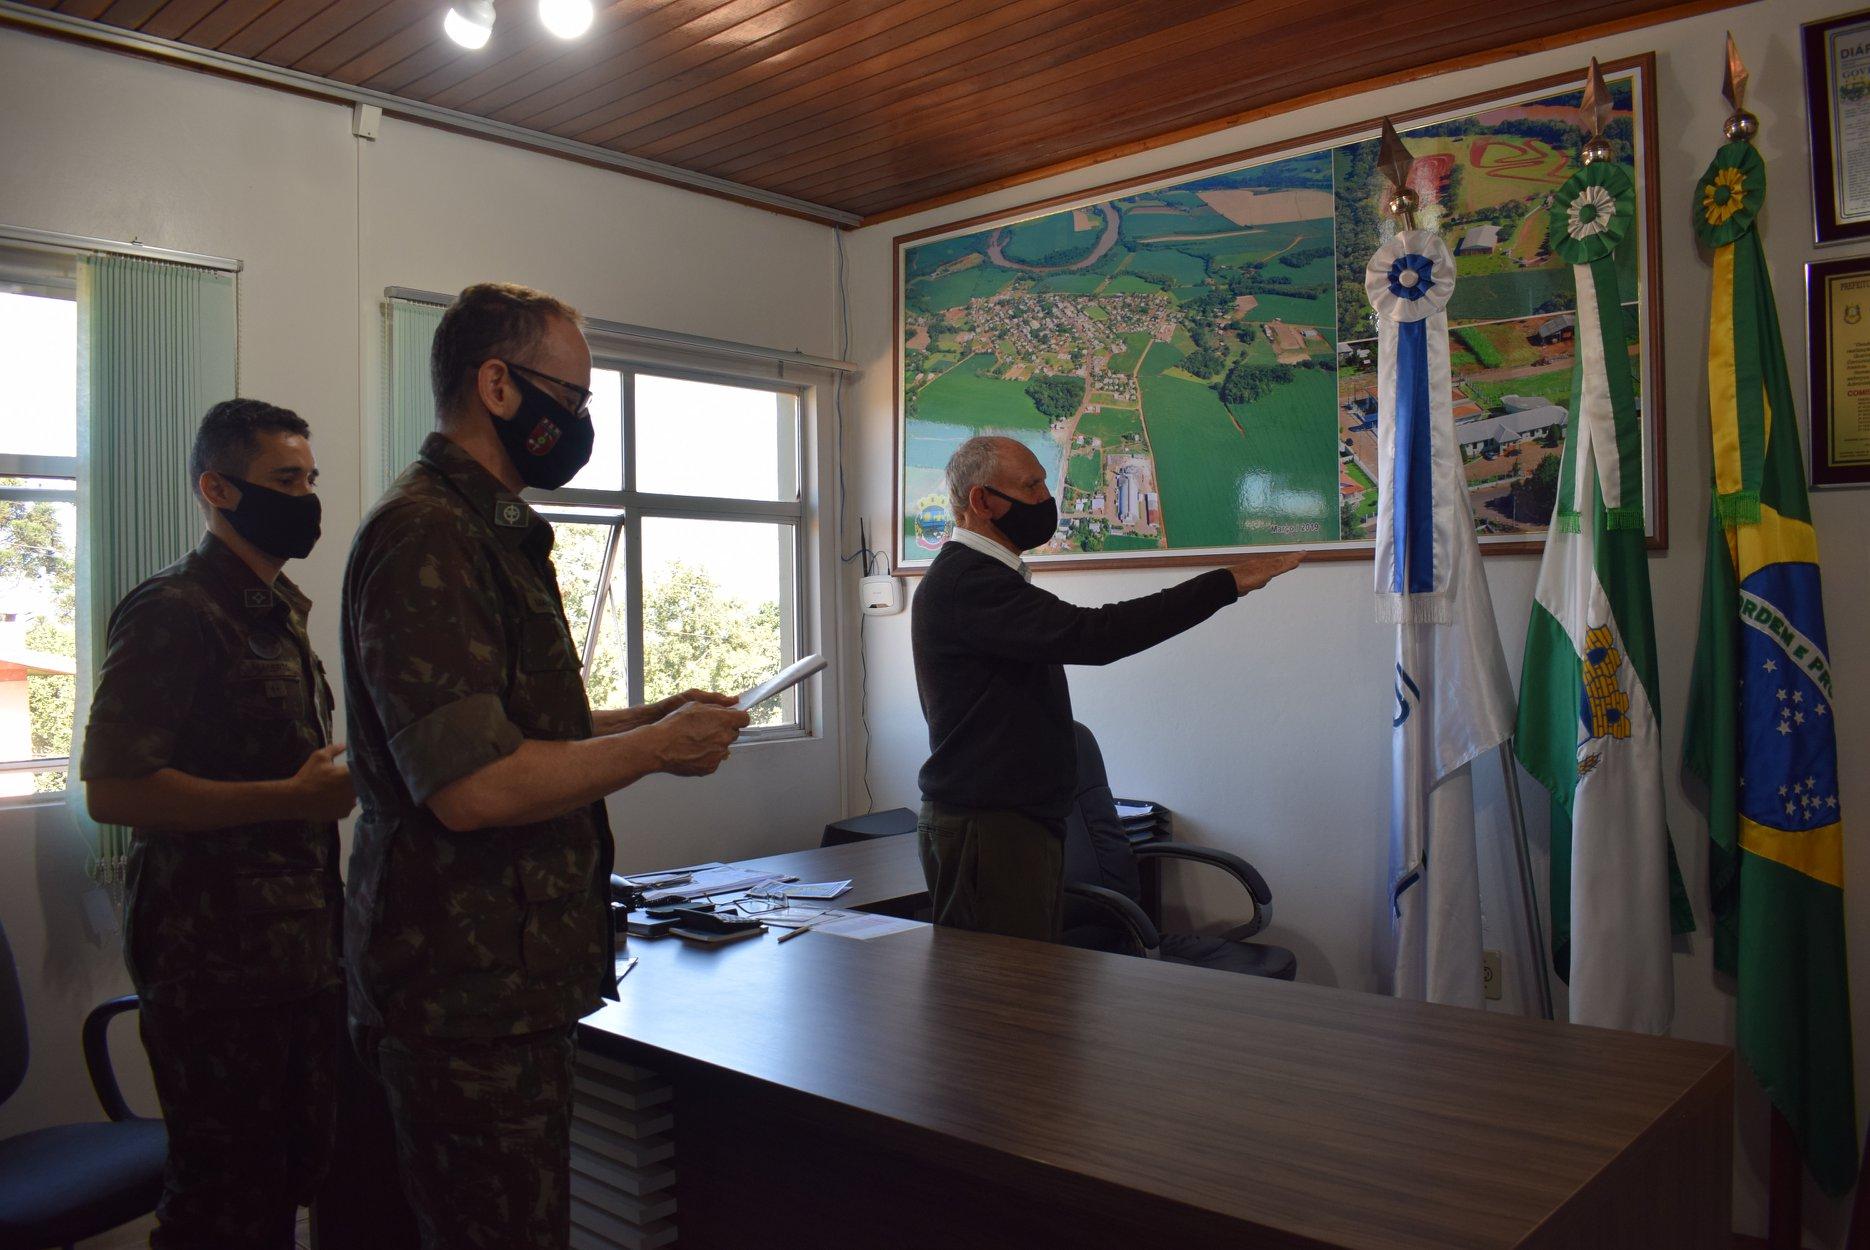 Prefeito Avelino toma posse como presidente na Junta Militar de Alto Alegre